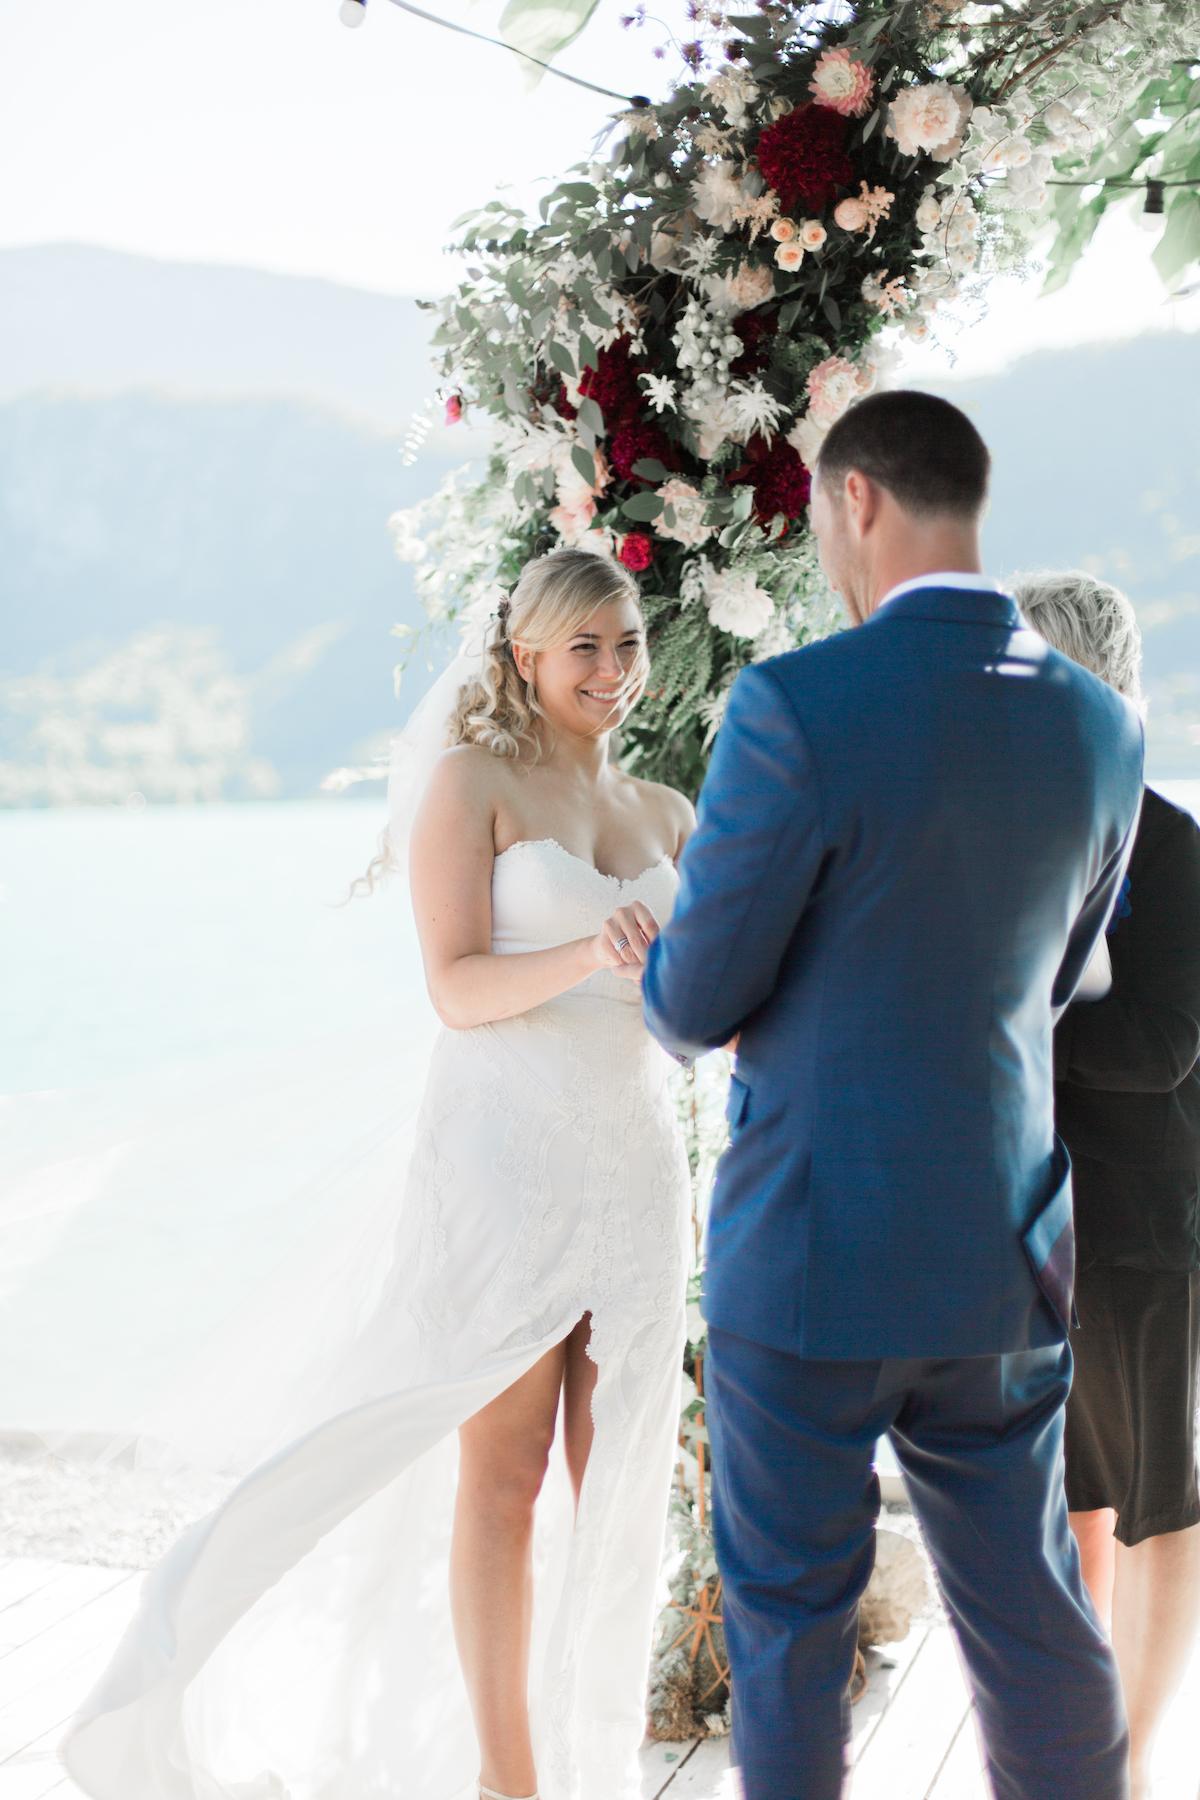 annecy-wedding-photos-122.jpg